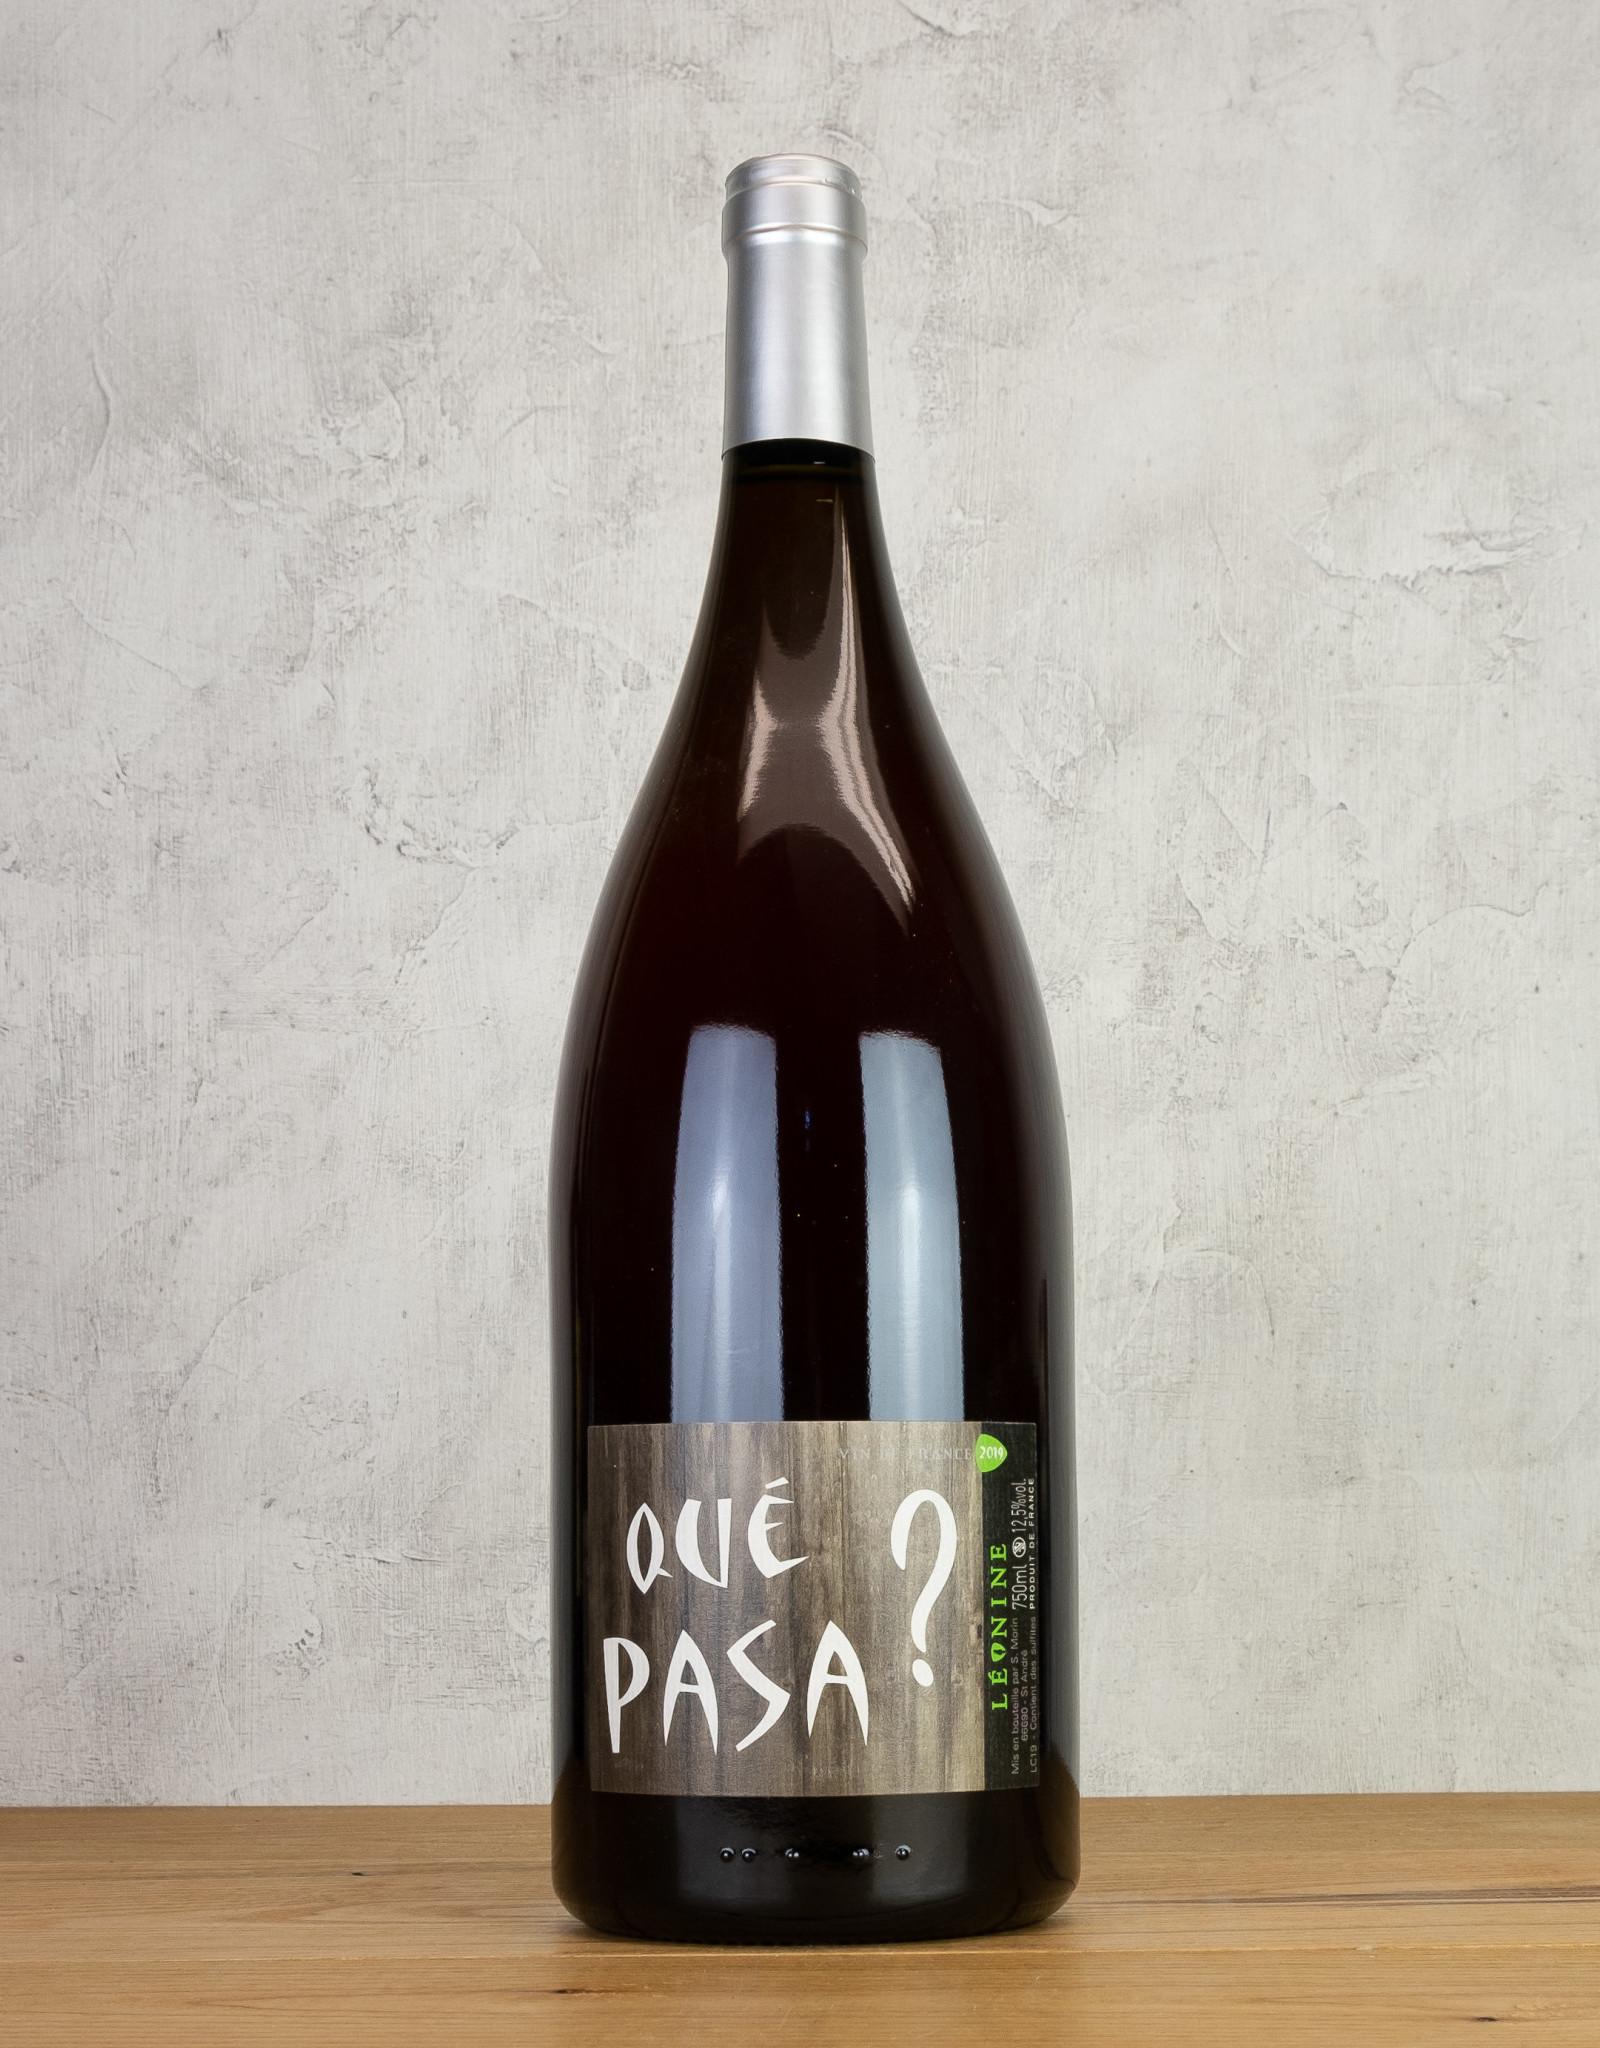 Domaine Leonine Que Pasa? Rose 1.5L